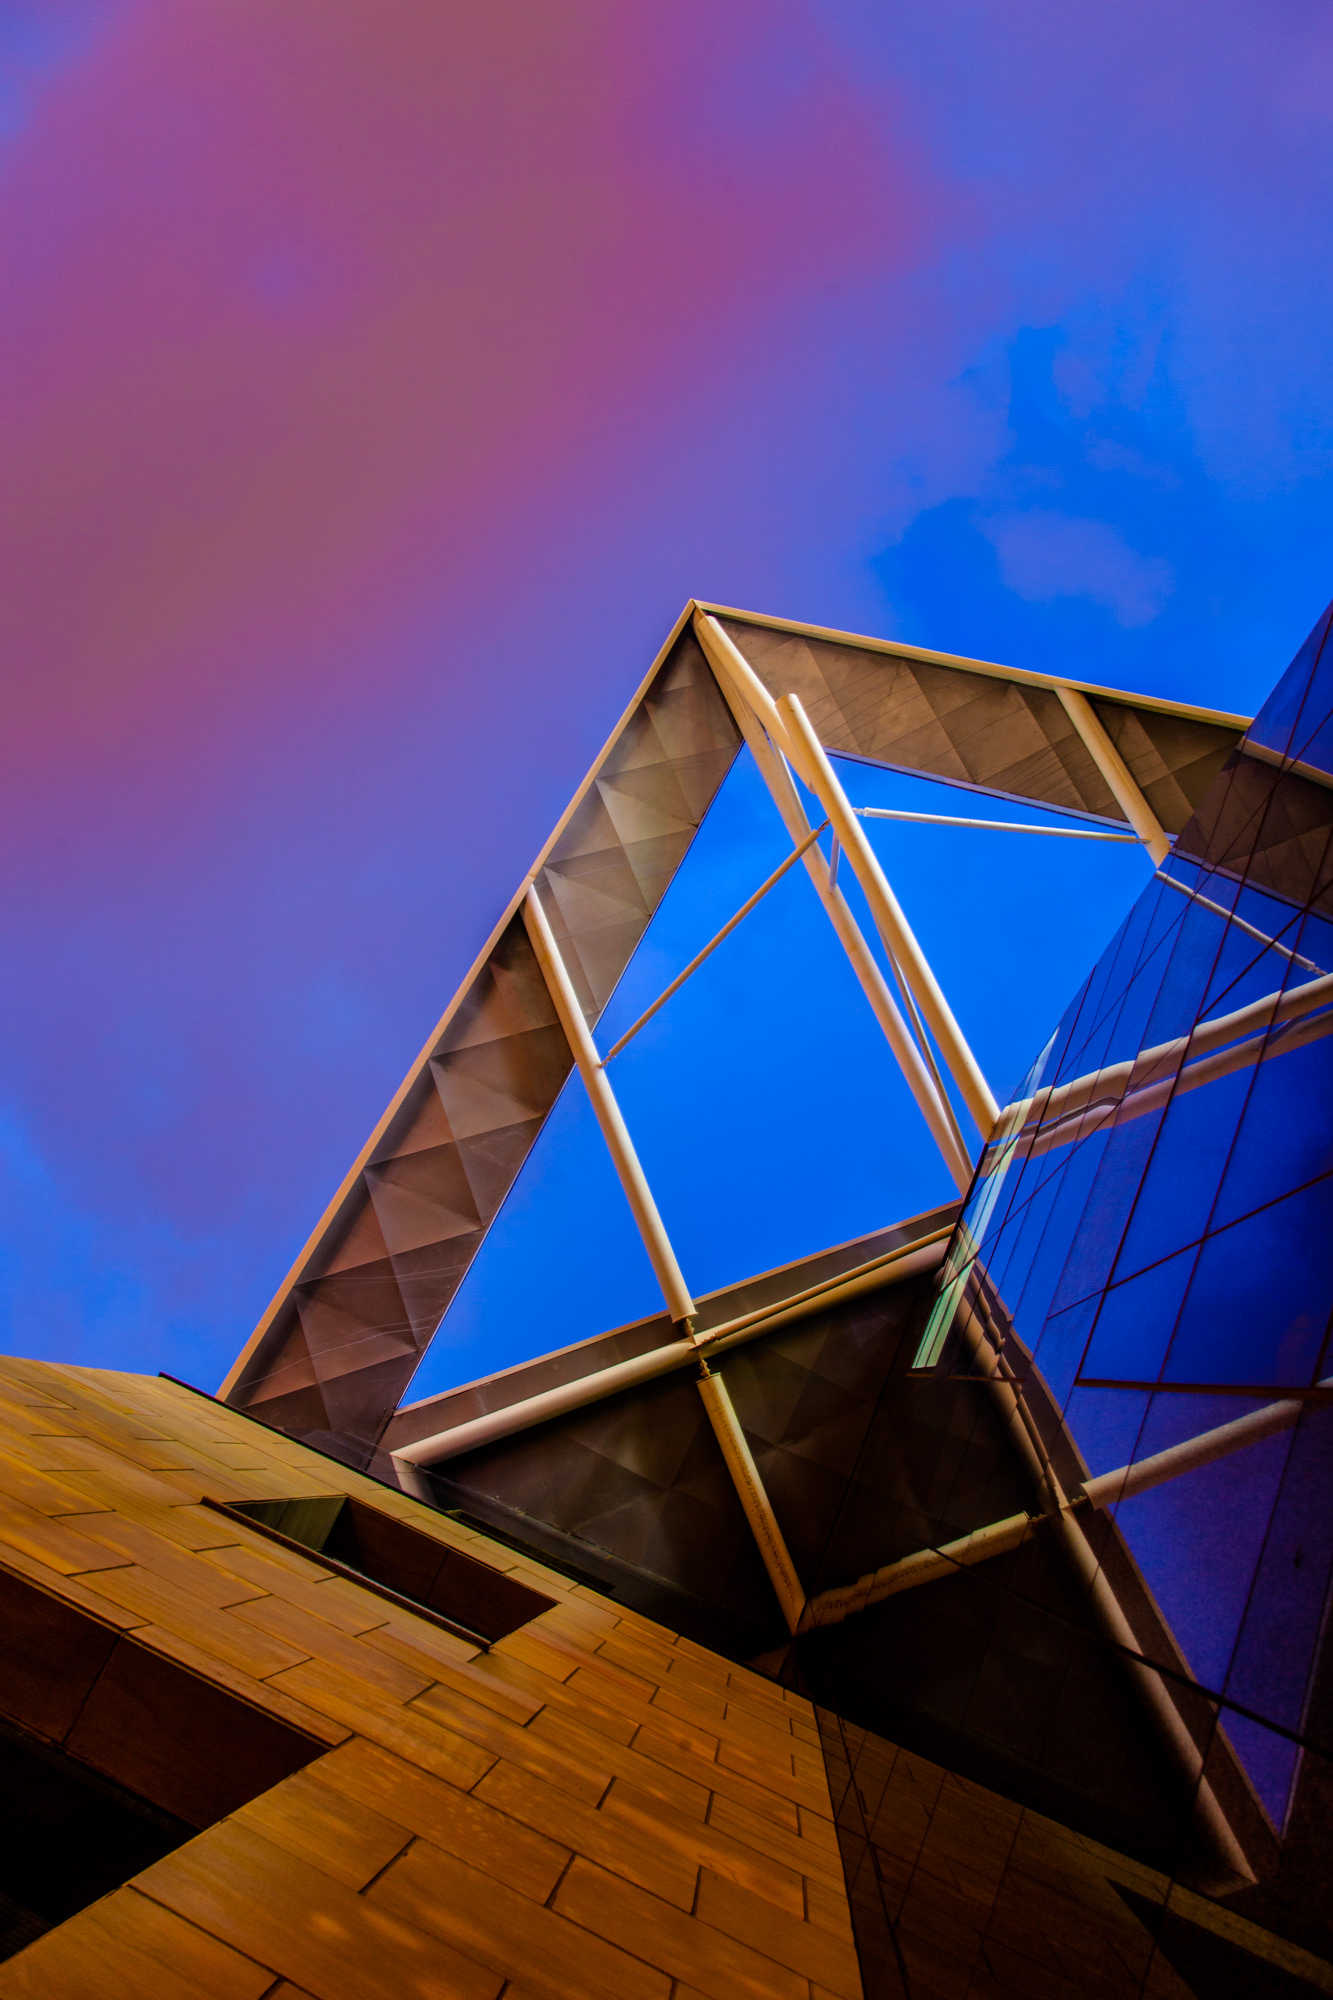 tim gerges architecture photographer Rea vaya-8972.jpg